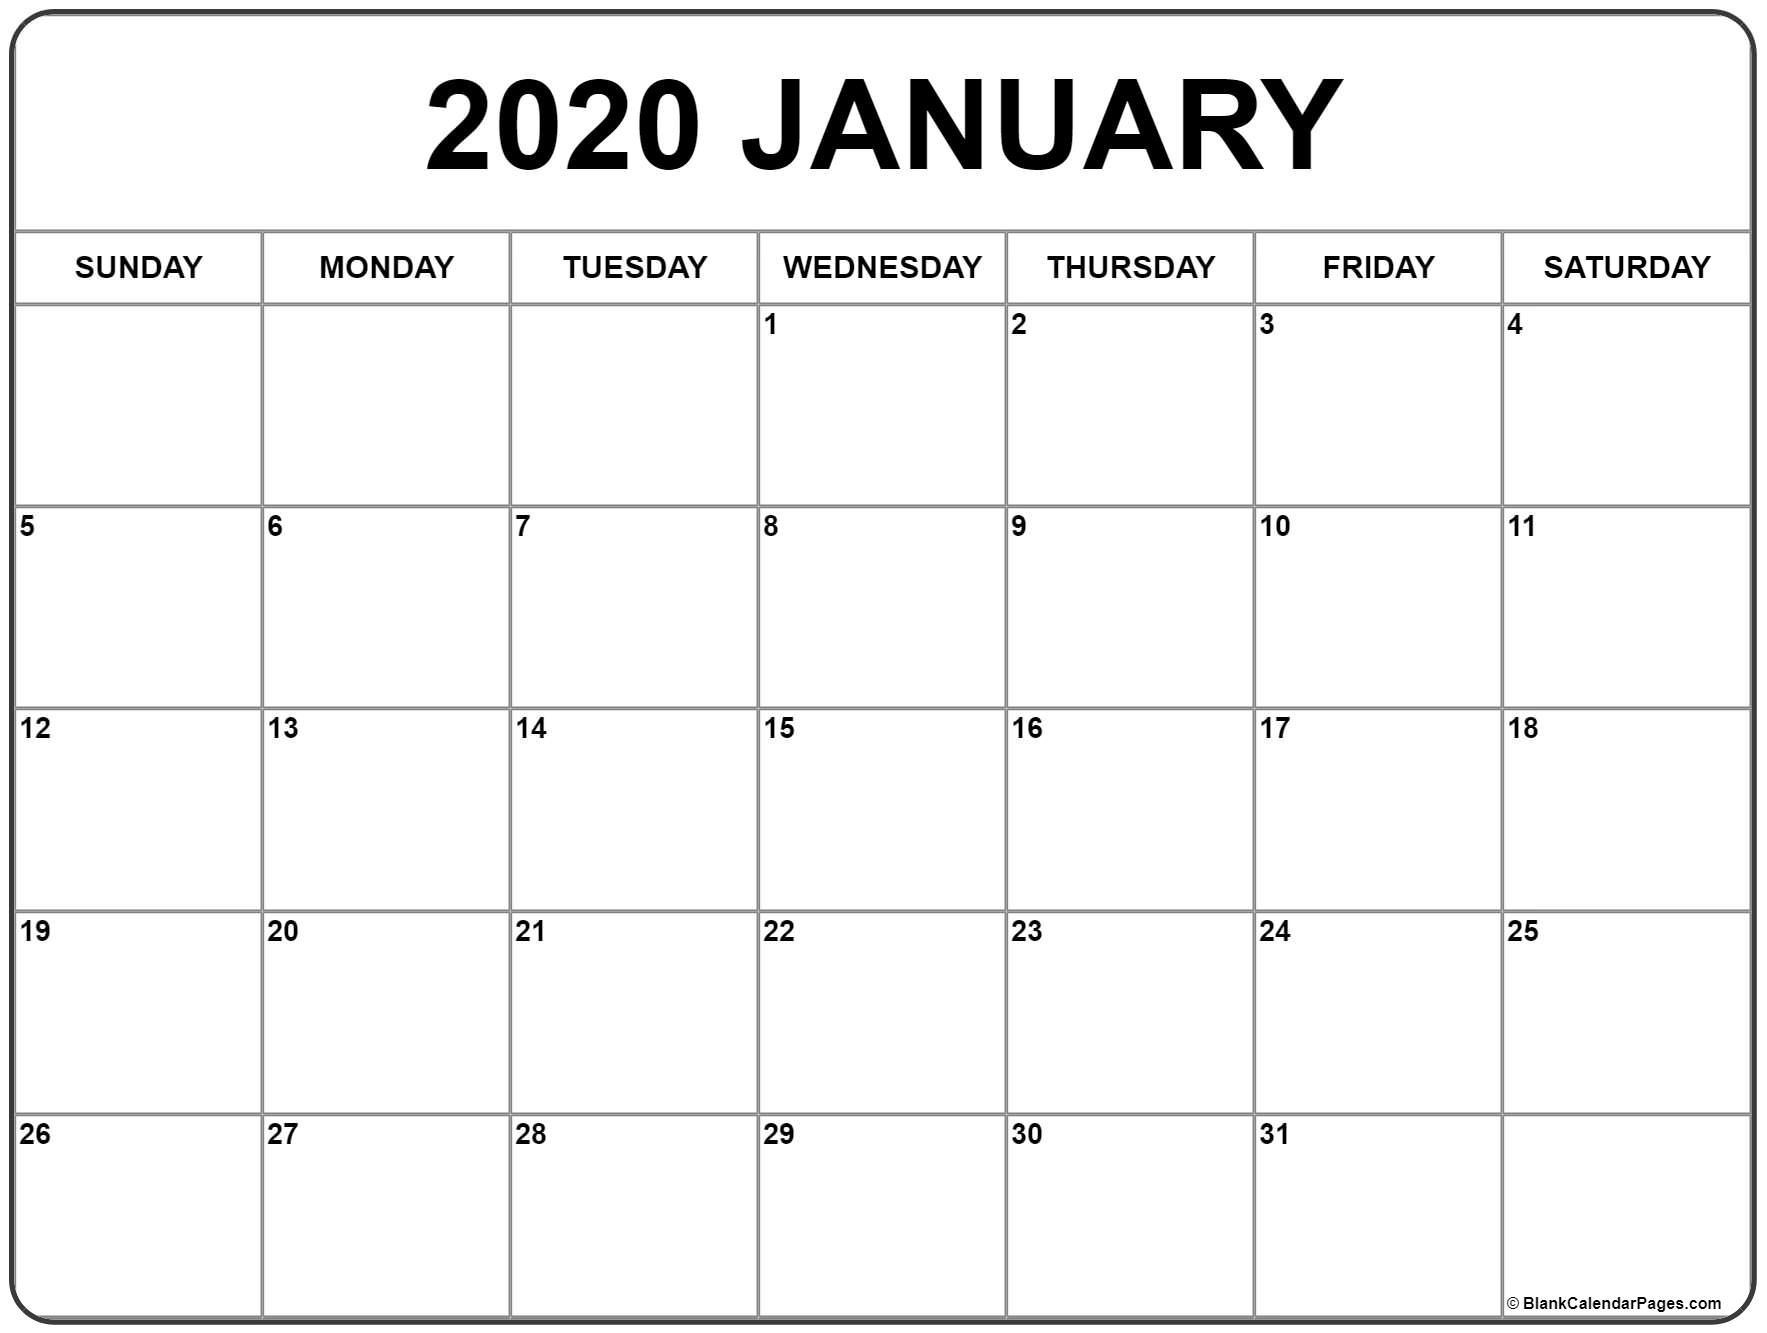 January 2020 Calendar | Free Printable Monthly Calendars-January 2020 Calendar Australia